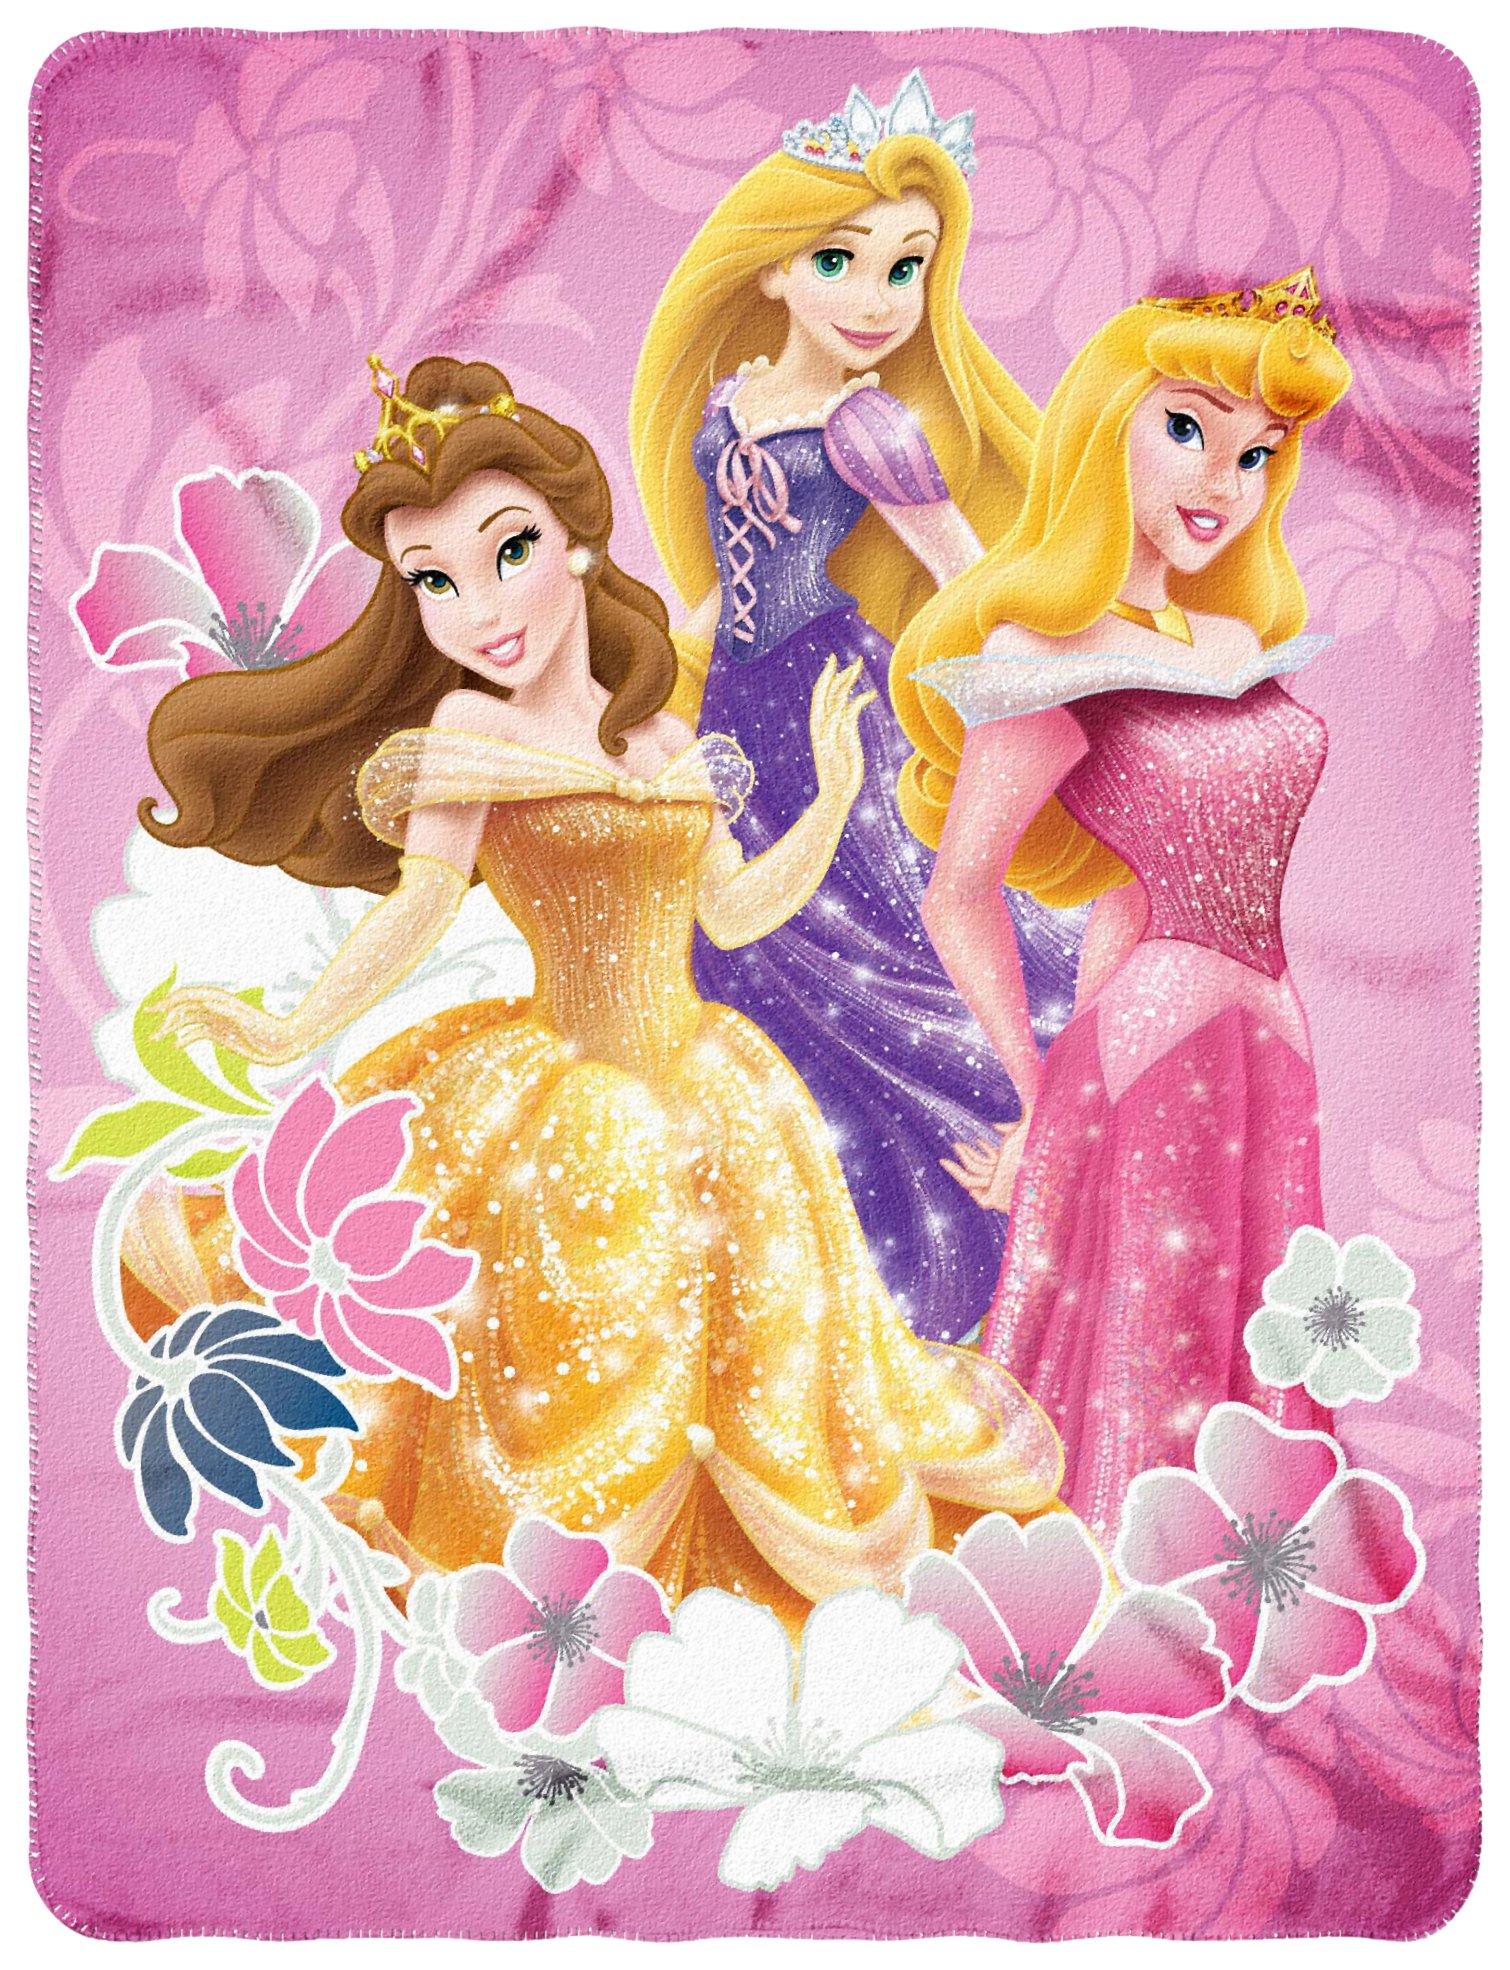 Disney Princesses, ''Shining Flowers'' Fleece Throw Blanket, 45'' x 60''